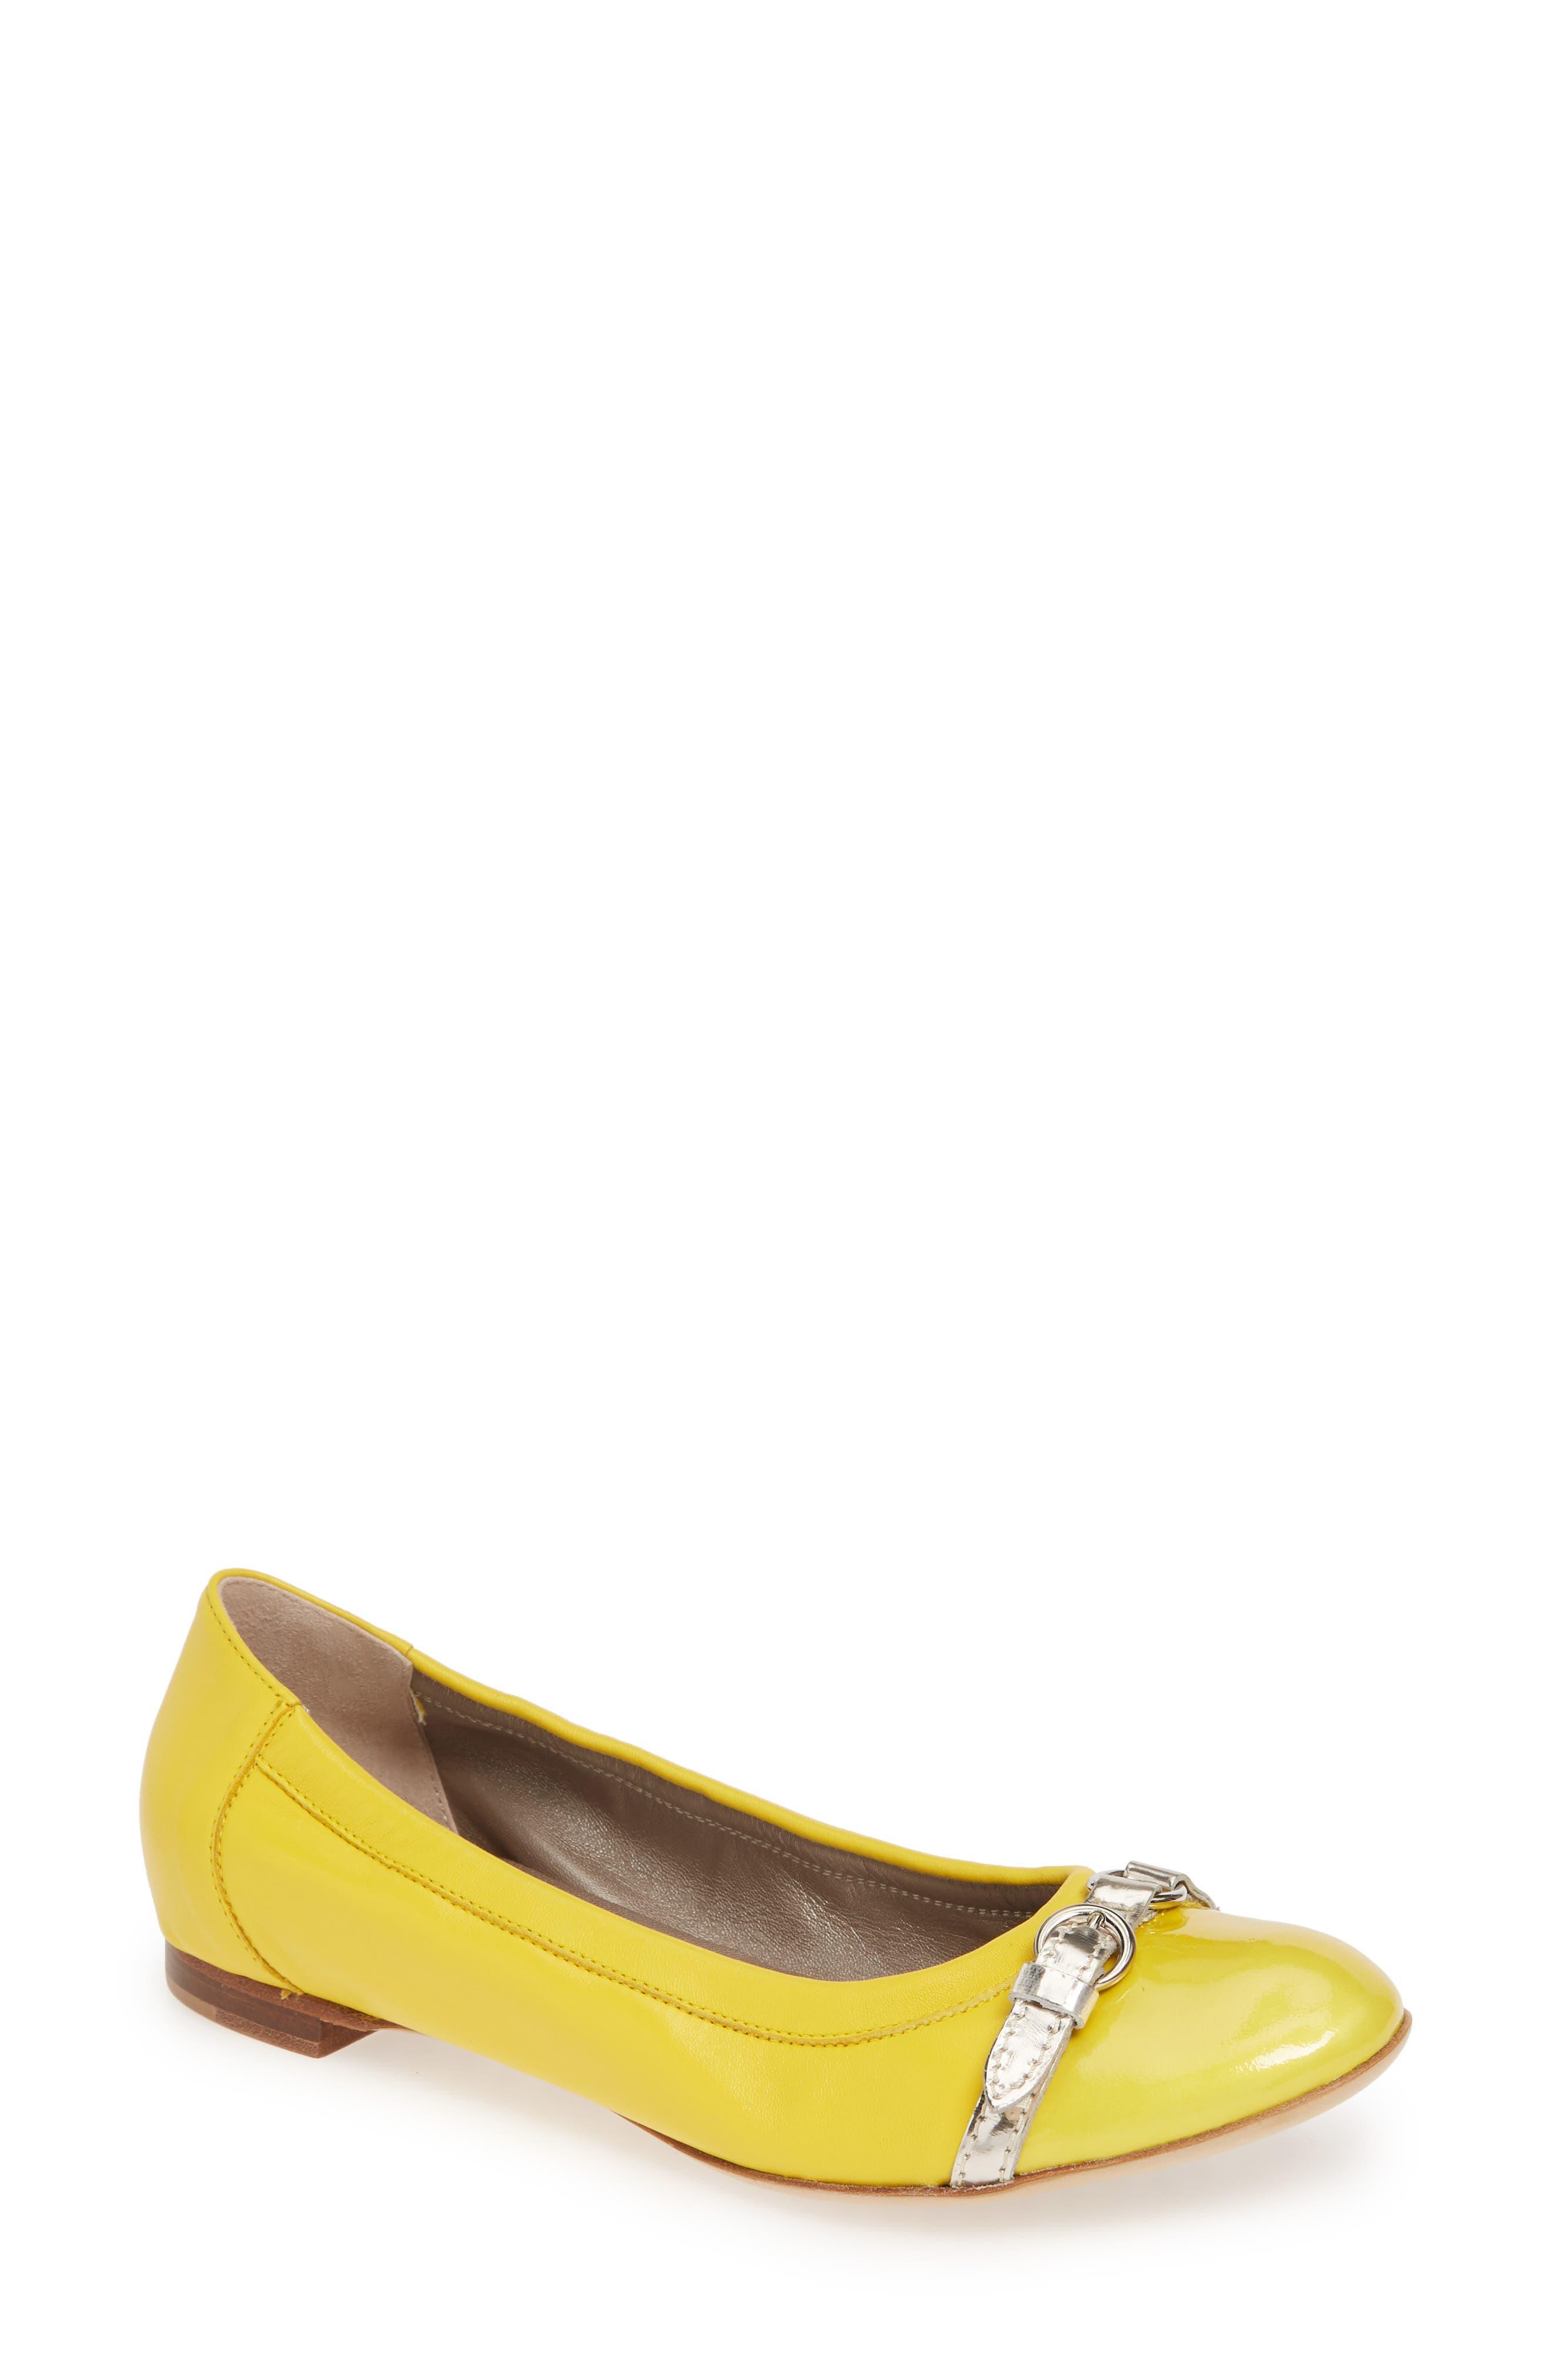 Agl Cap Toe Ballet FlatUS / 42.5EU - Yellow